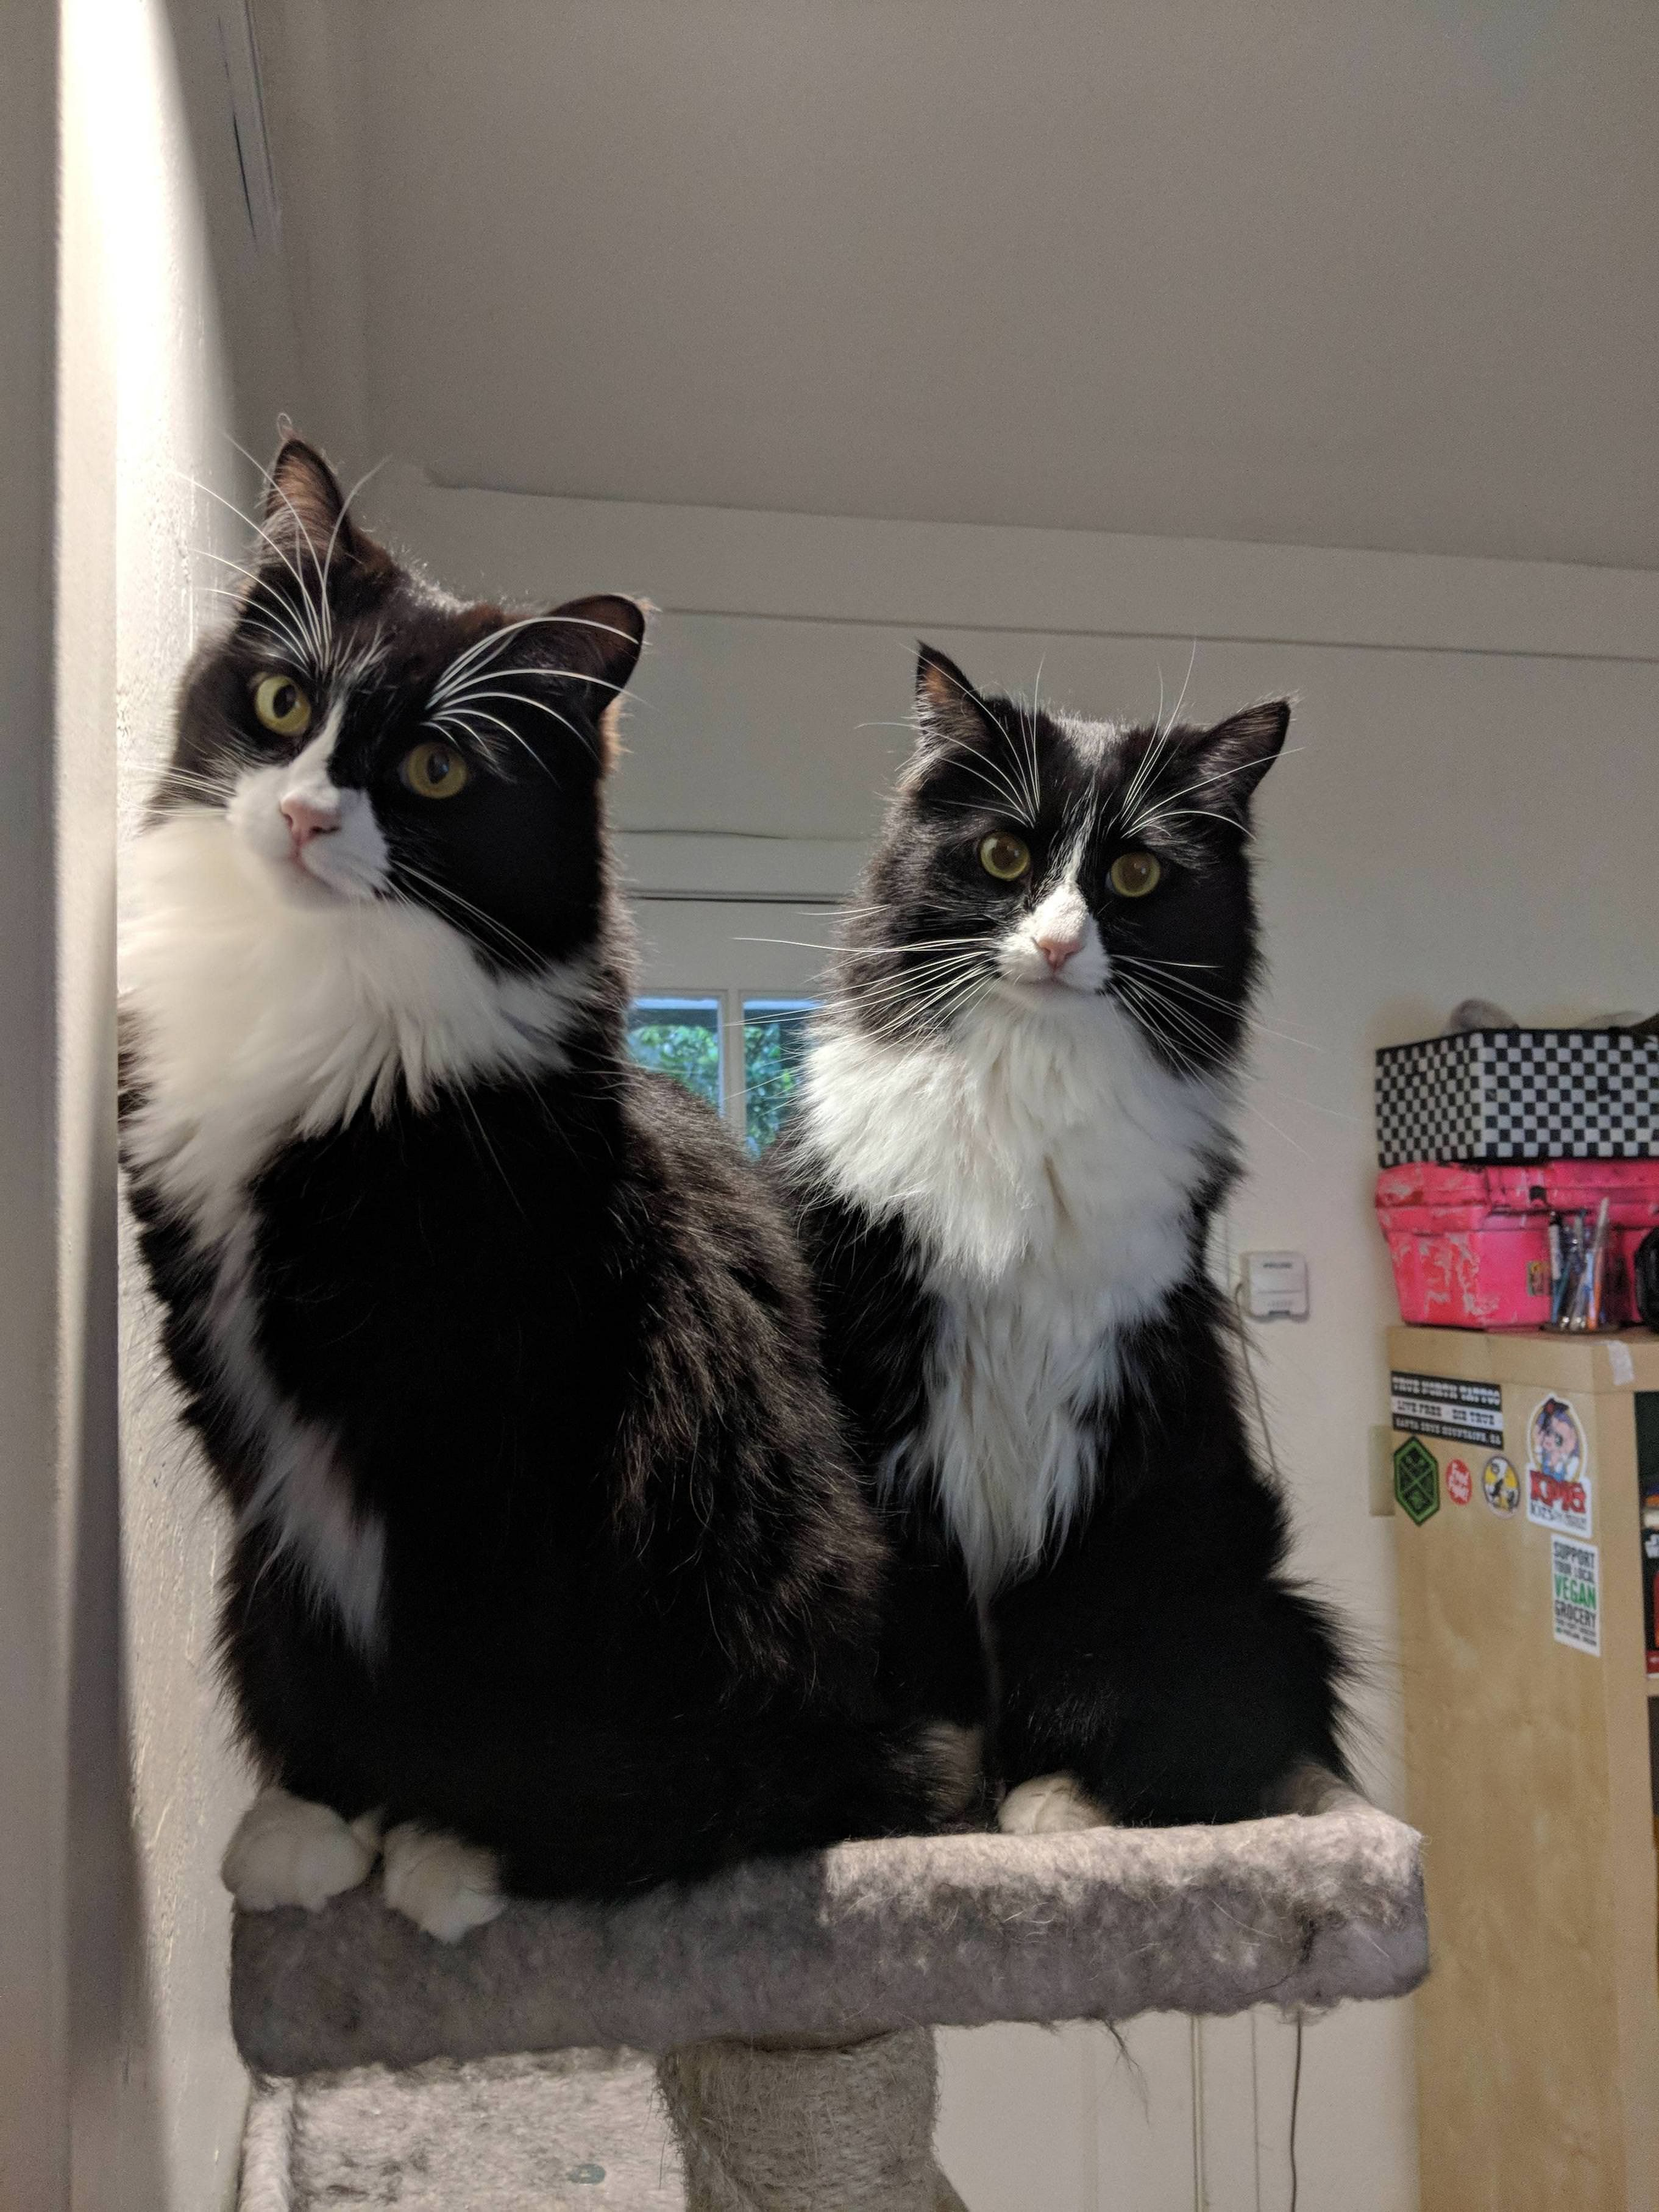 I call them The Twins, meet Artie and Luna! Pretty cats